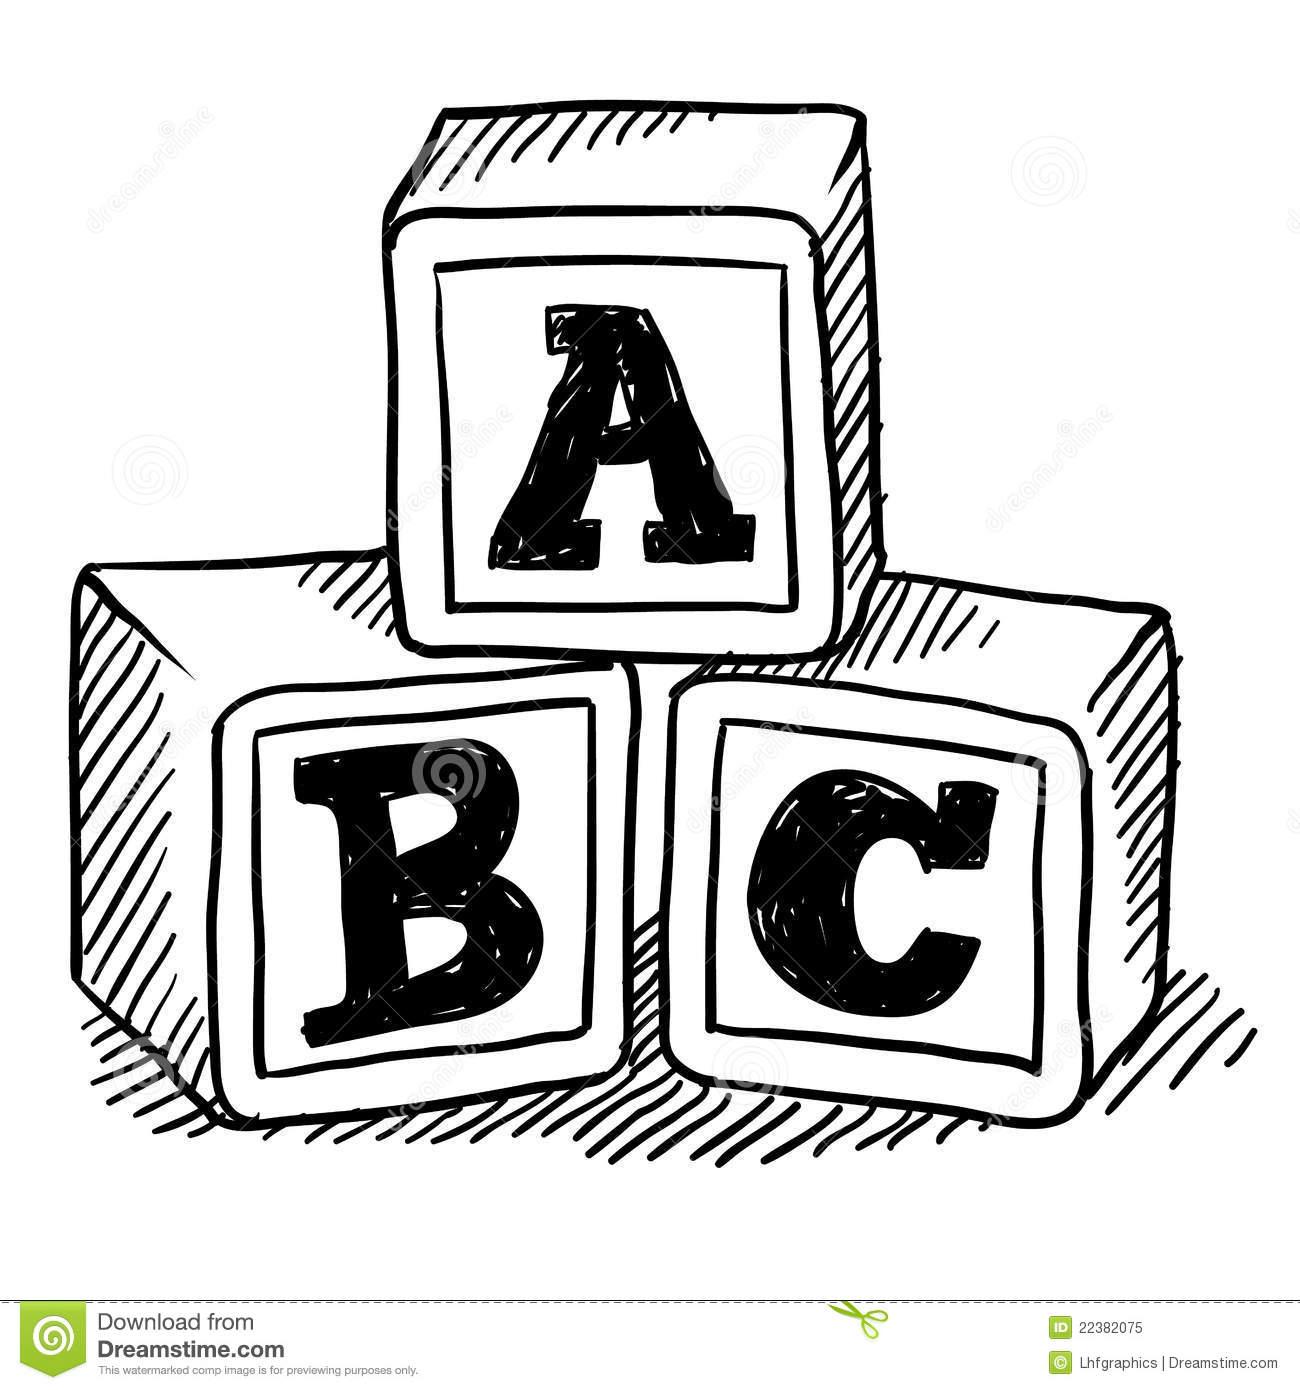 Block area clipart clip free Block Area Black And White Clipart - Clipart Kid clip free